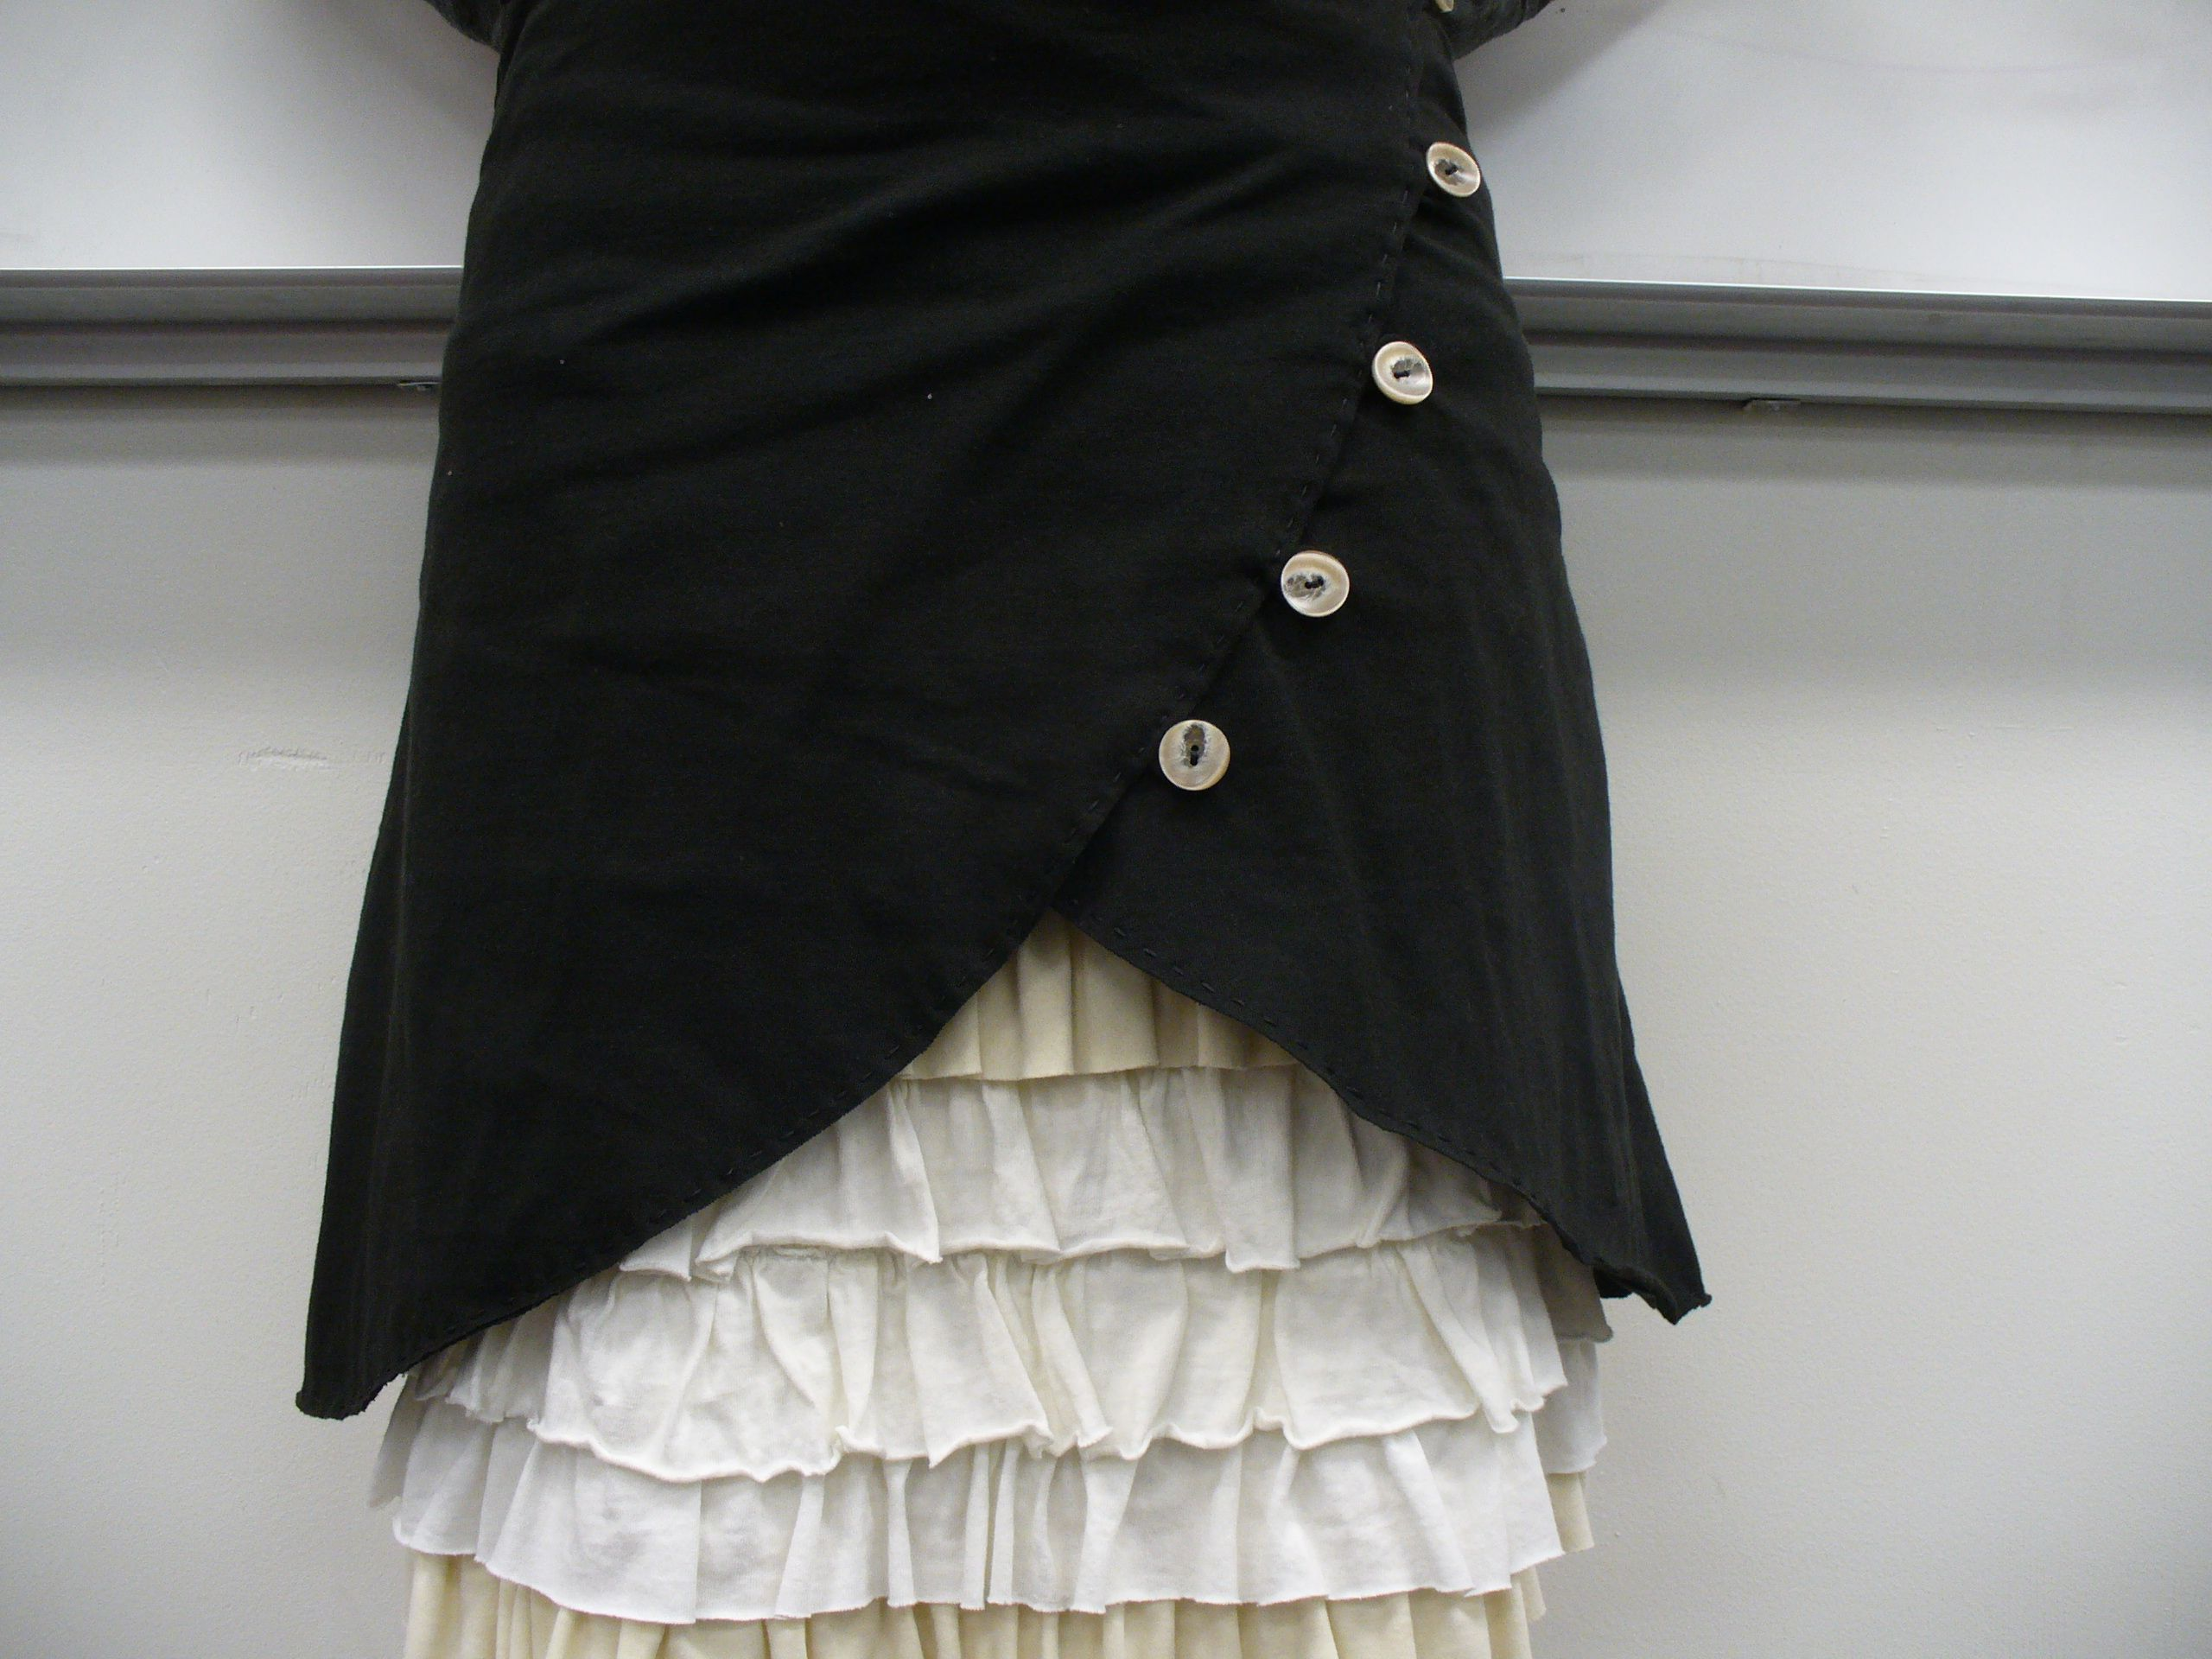 the over skirt | alte Jeans, Rock und Nähen